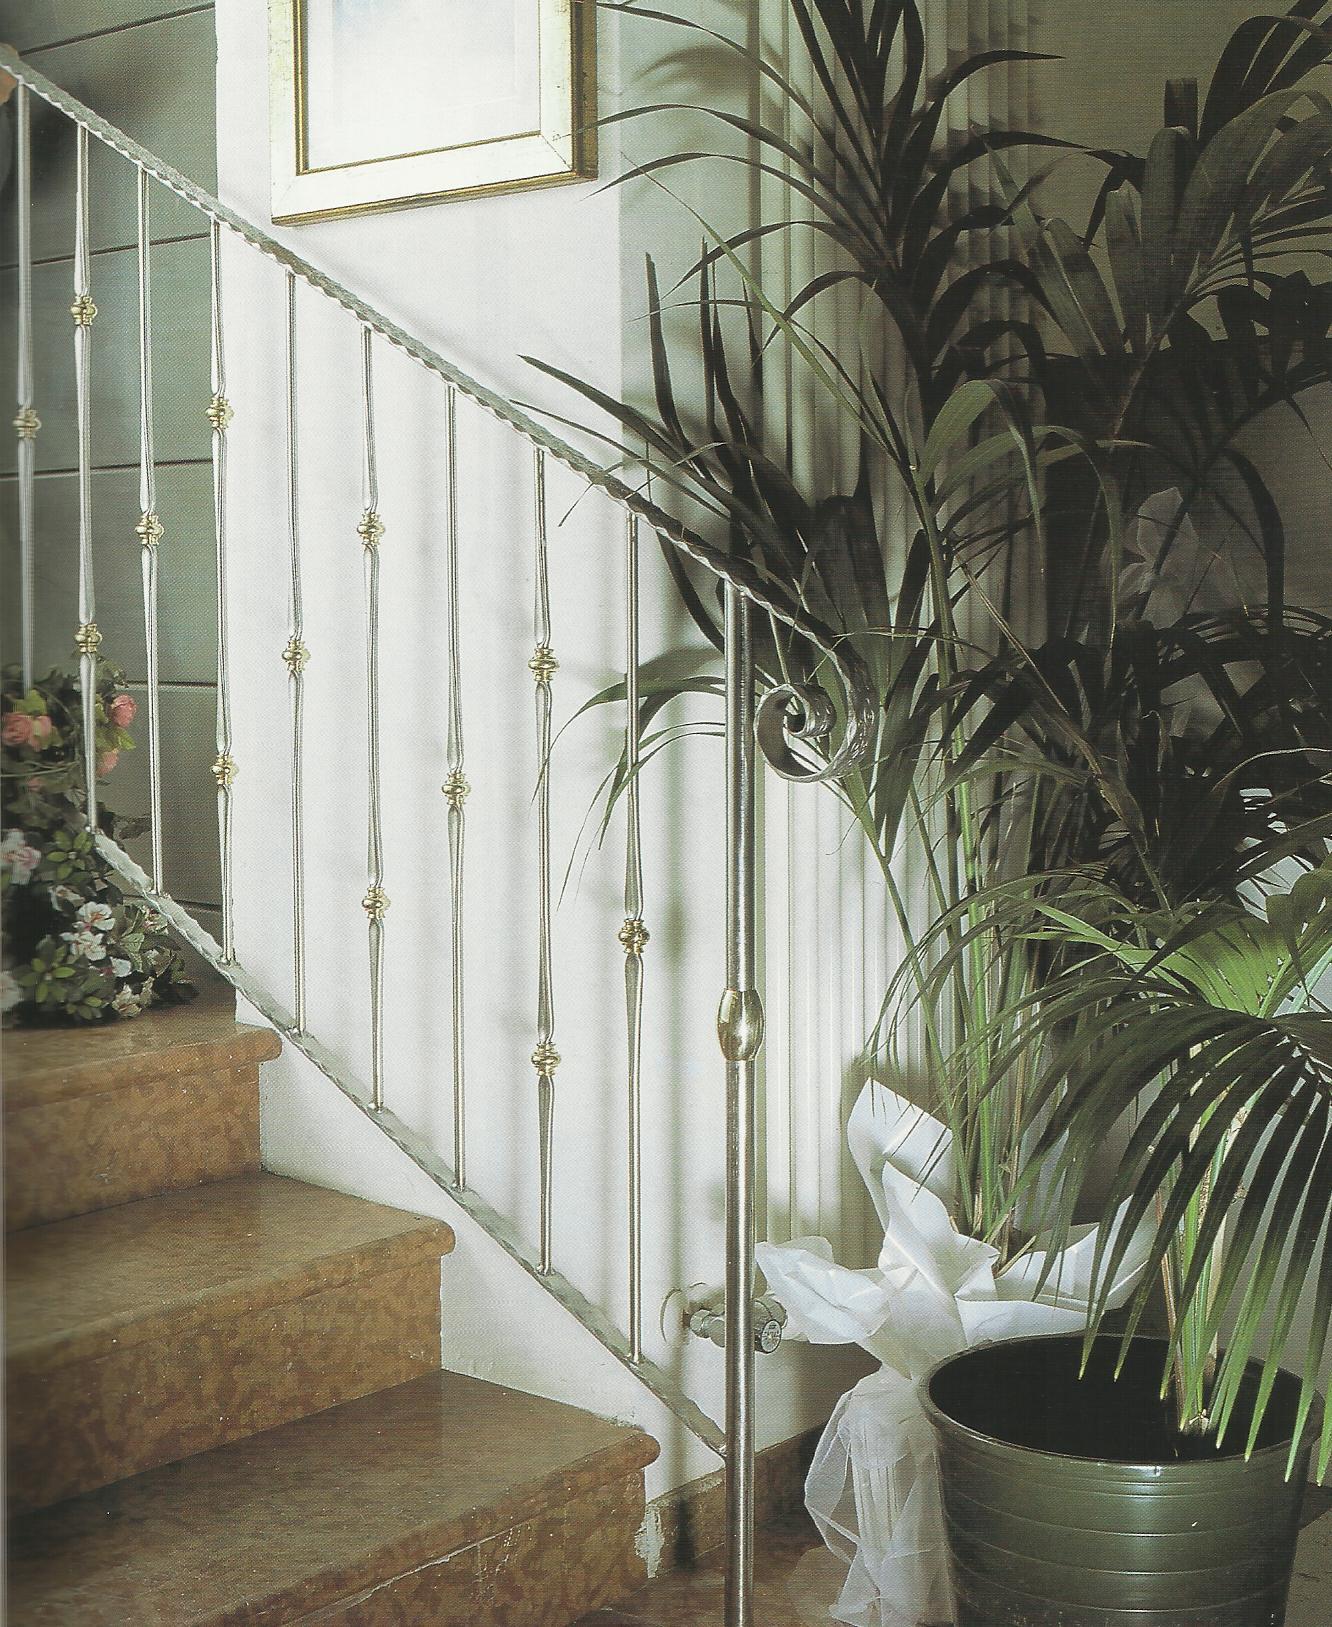 Escalera con adorno de lat n talleres met licos lar for Escaleras de adorno